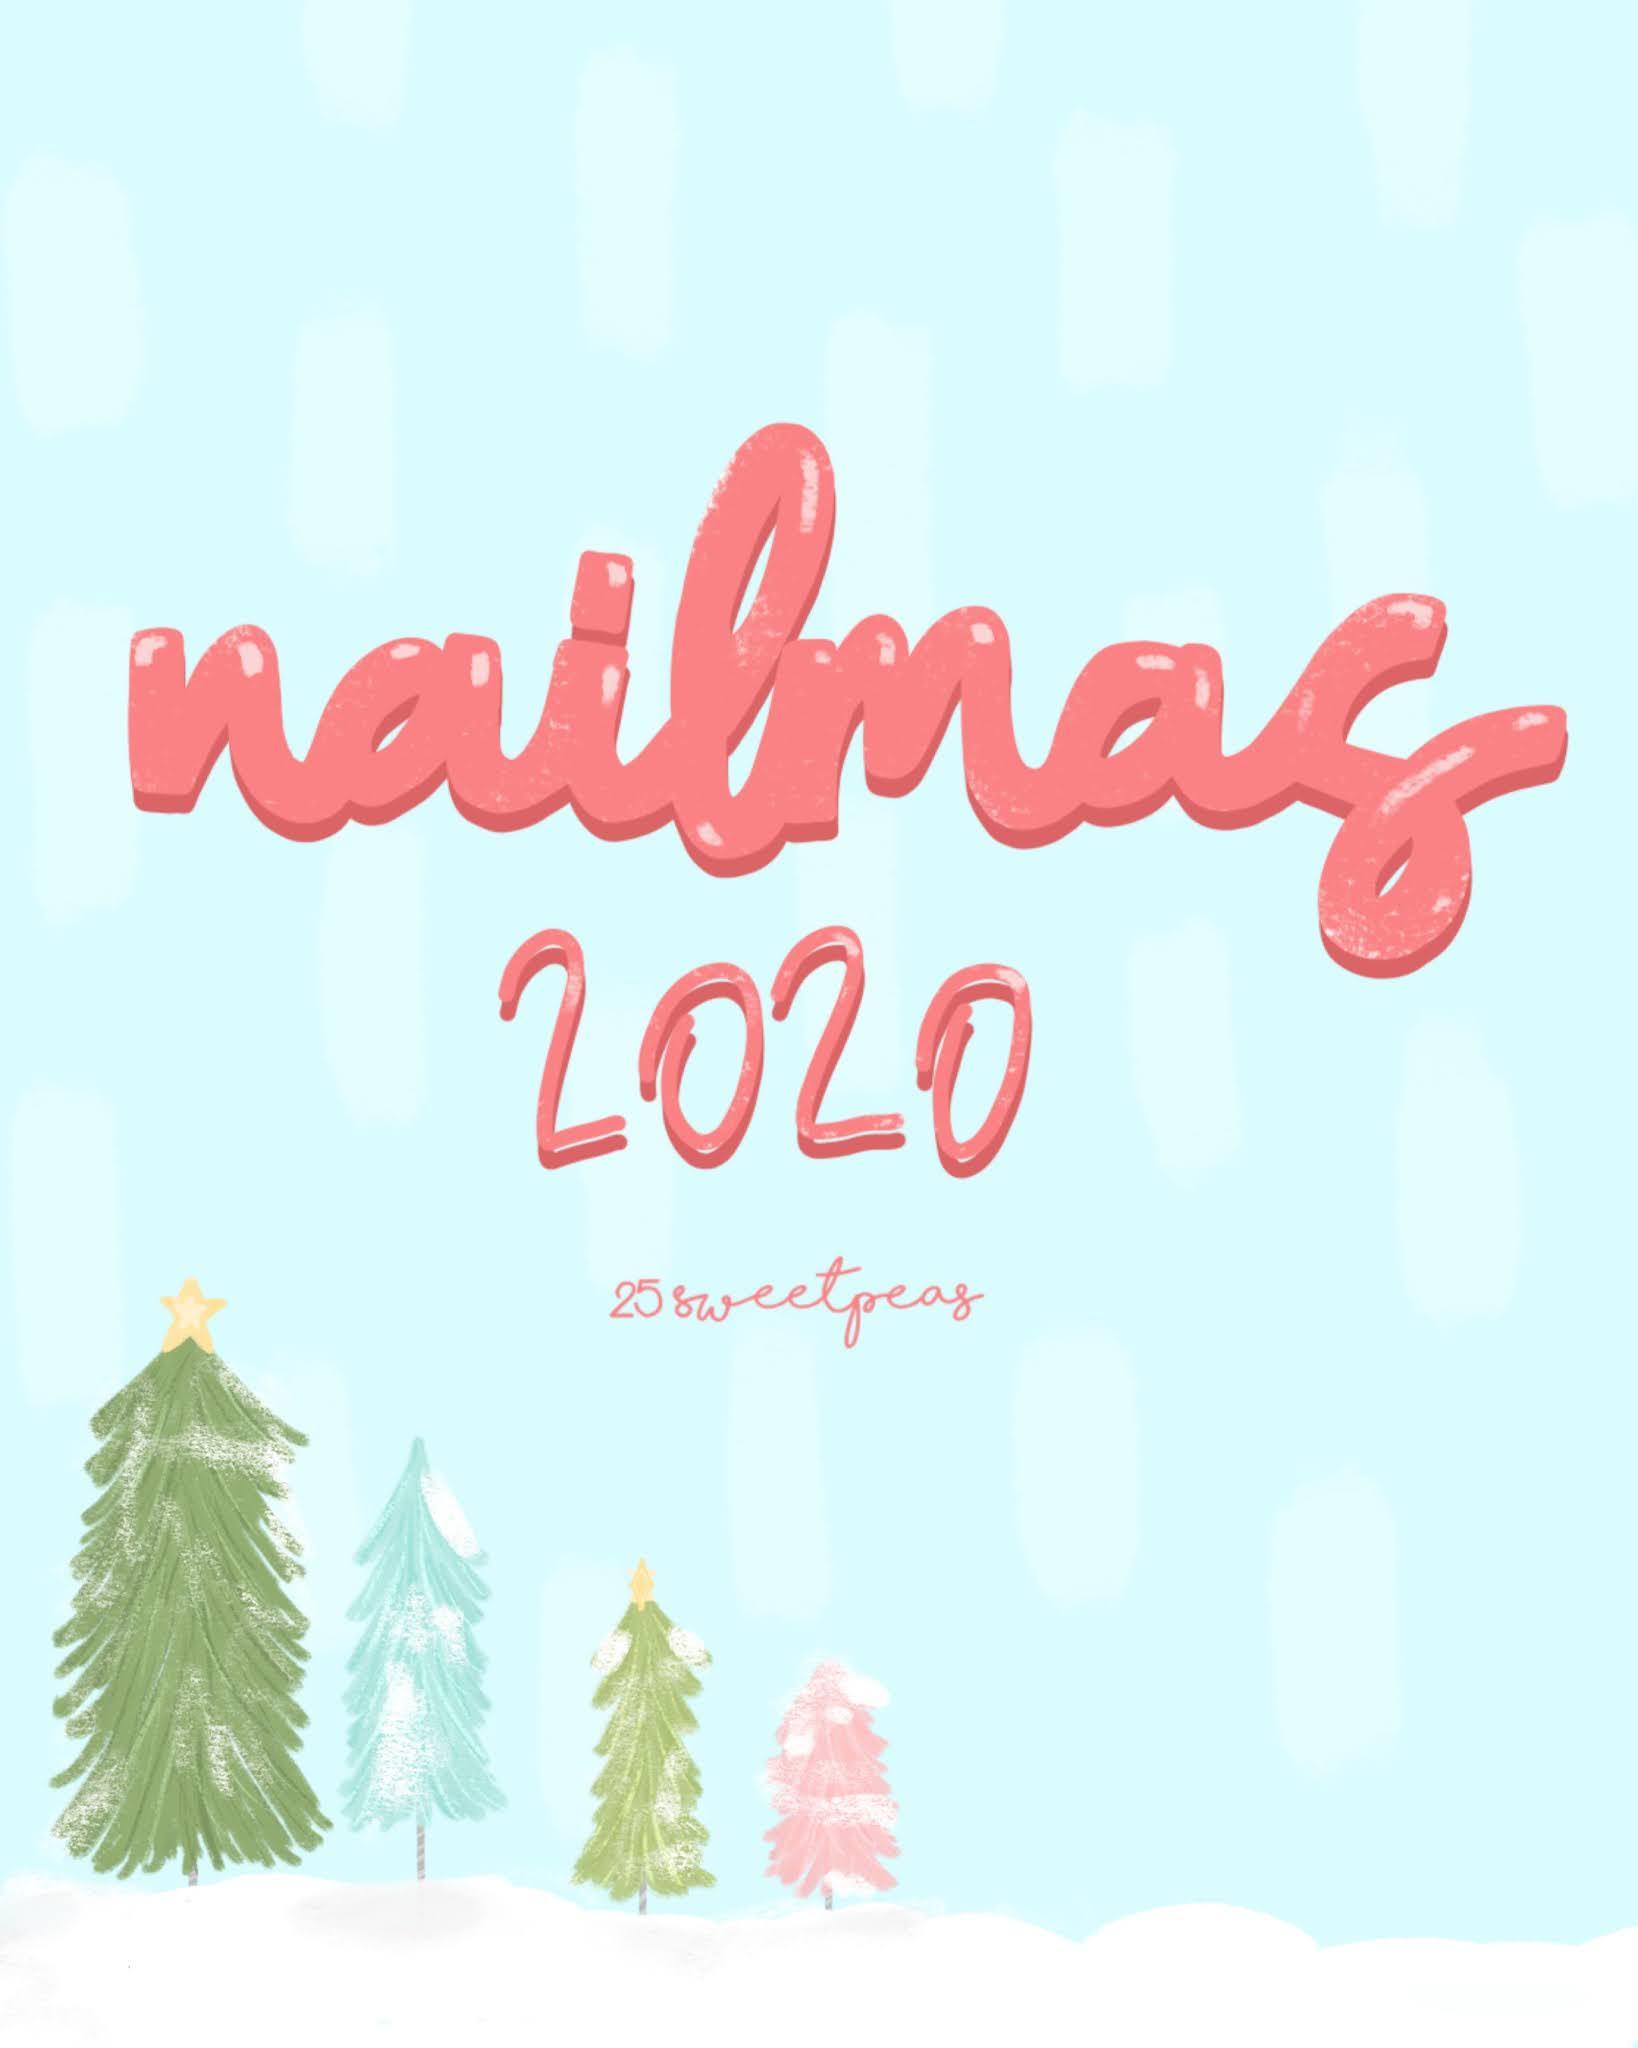 Nailmas 2020 _ 25 Sweetpeas